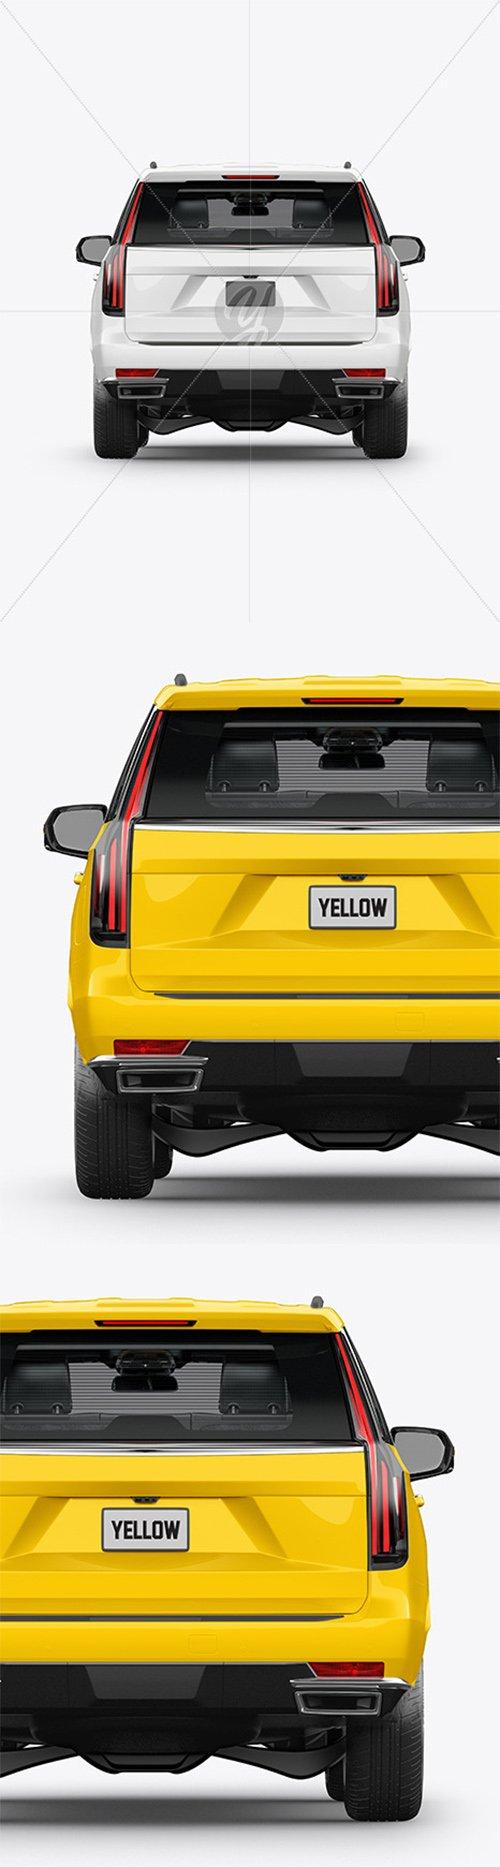 Luxury SUV Mockup - Back View 62259